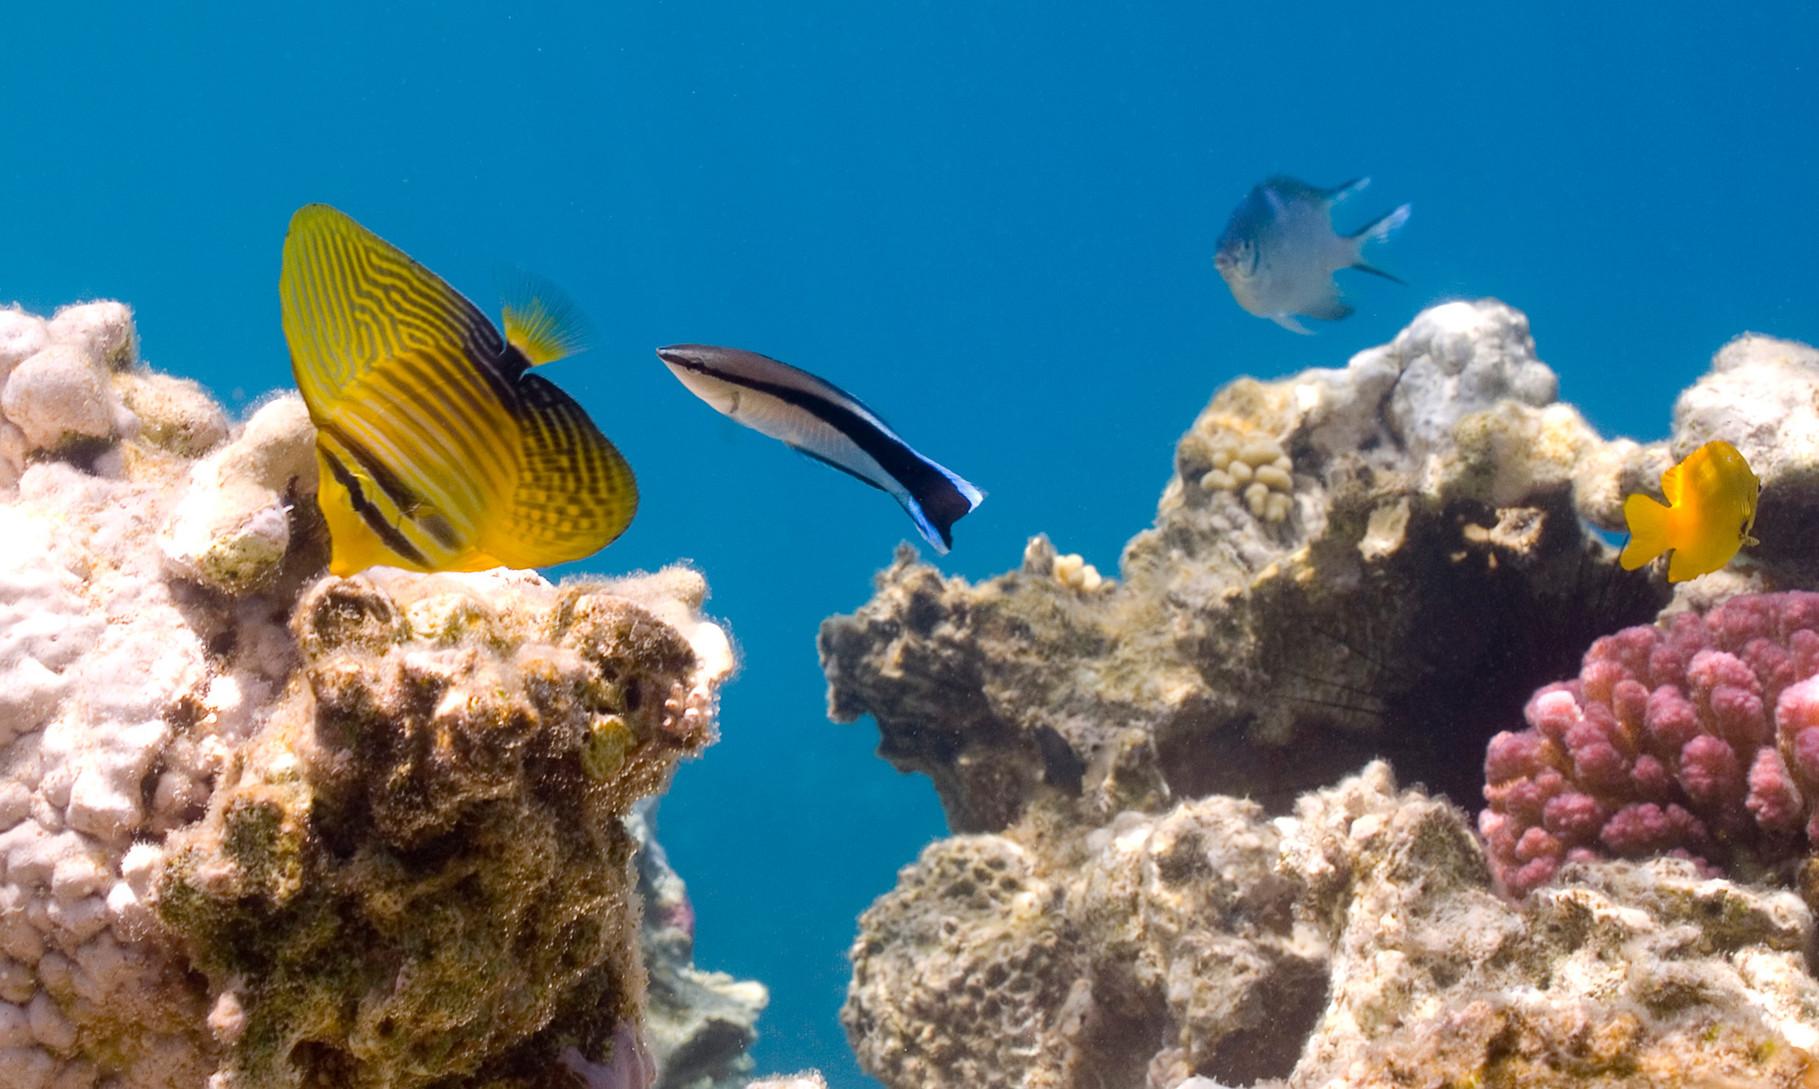 Juvenile Red Sea sailfin tang (Zebrasoma desjardinii)